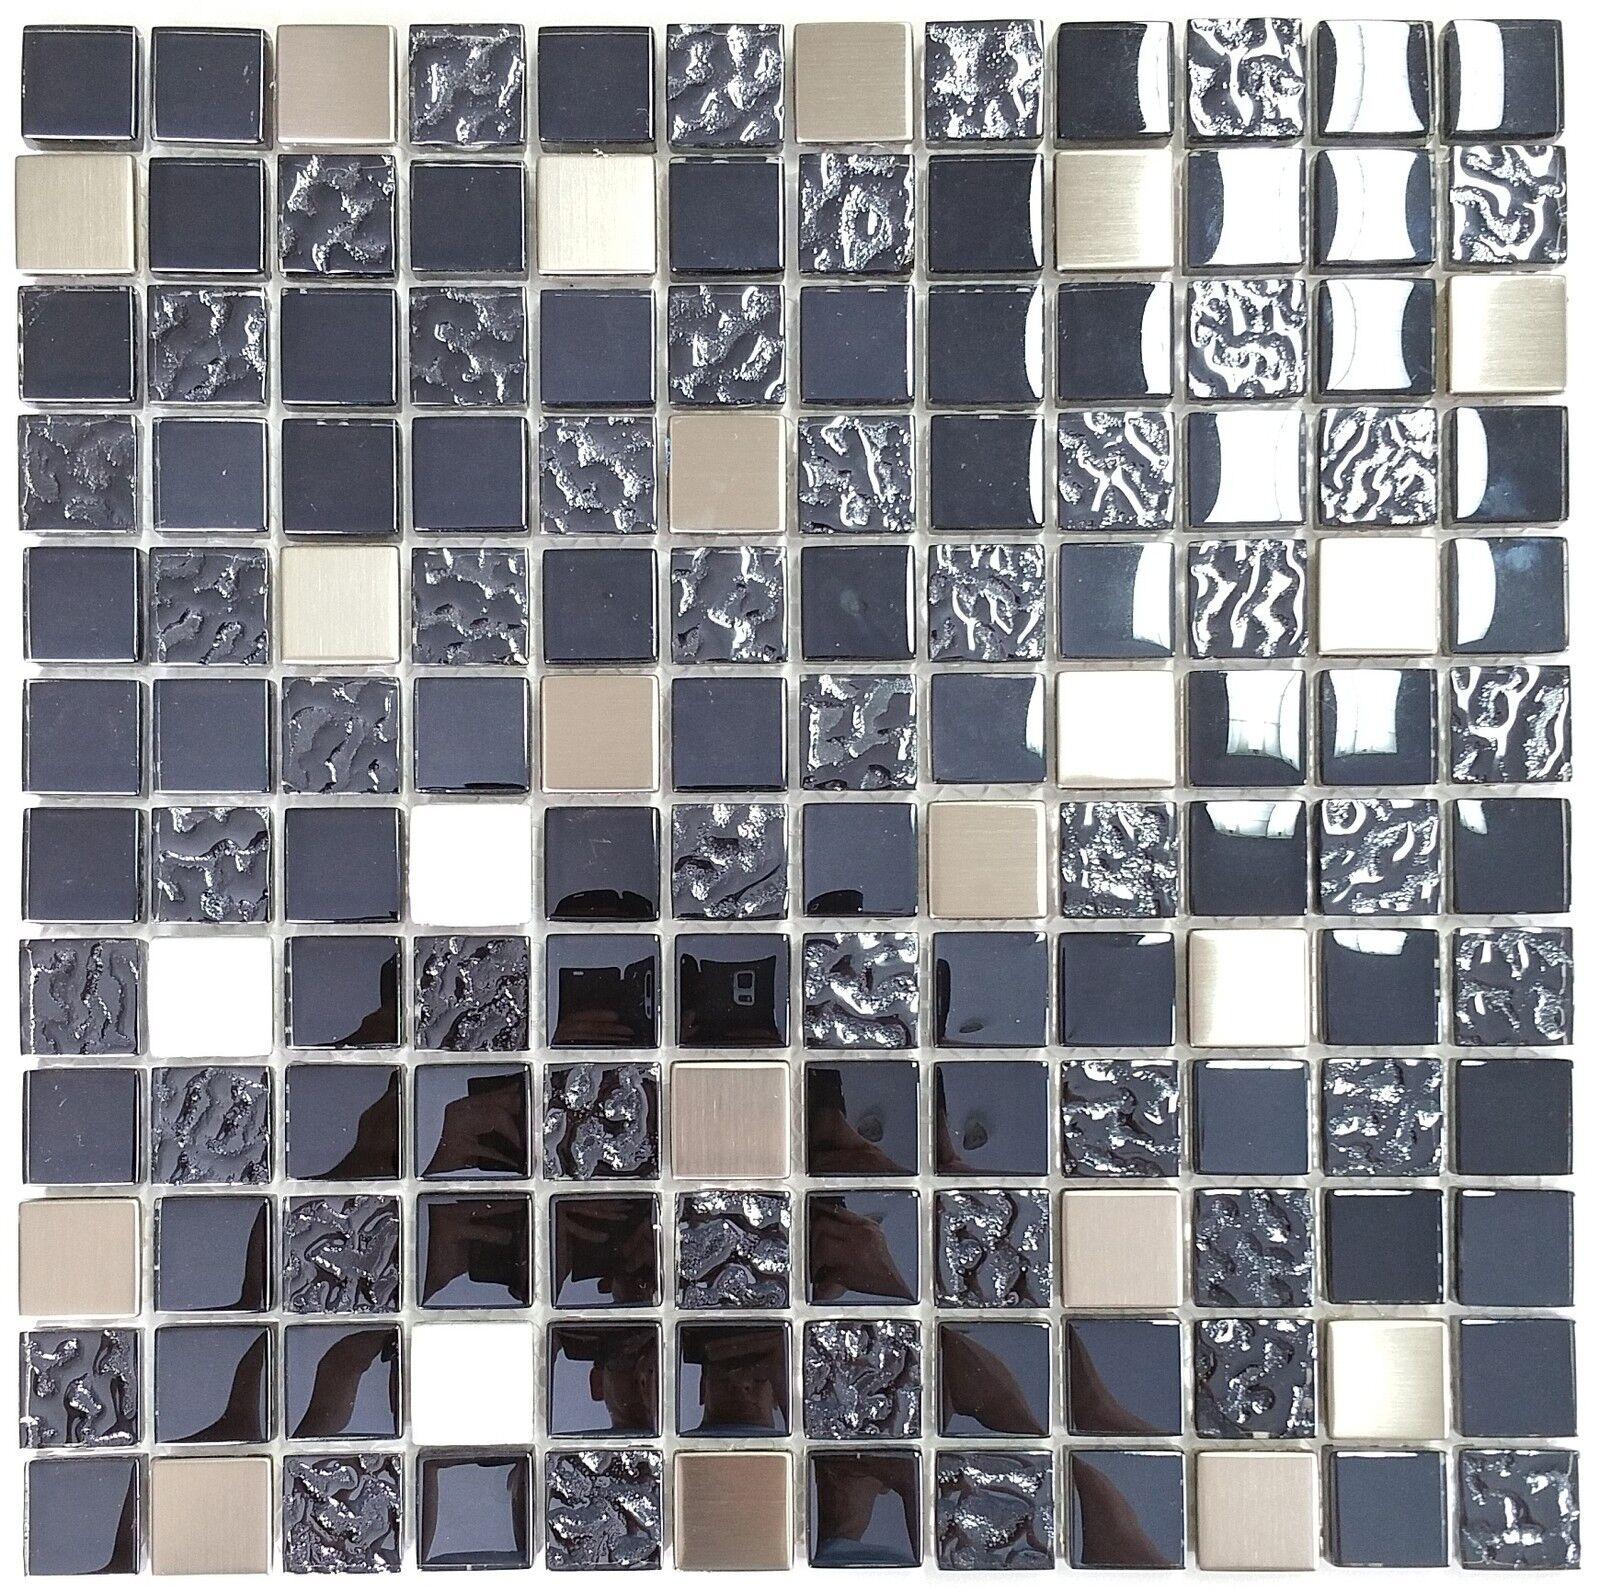 1 qm 30x30 cm Glasmosaik Edelstahl Mosaik Dark Night Deluxe grau silber Alu